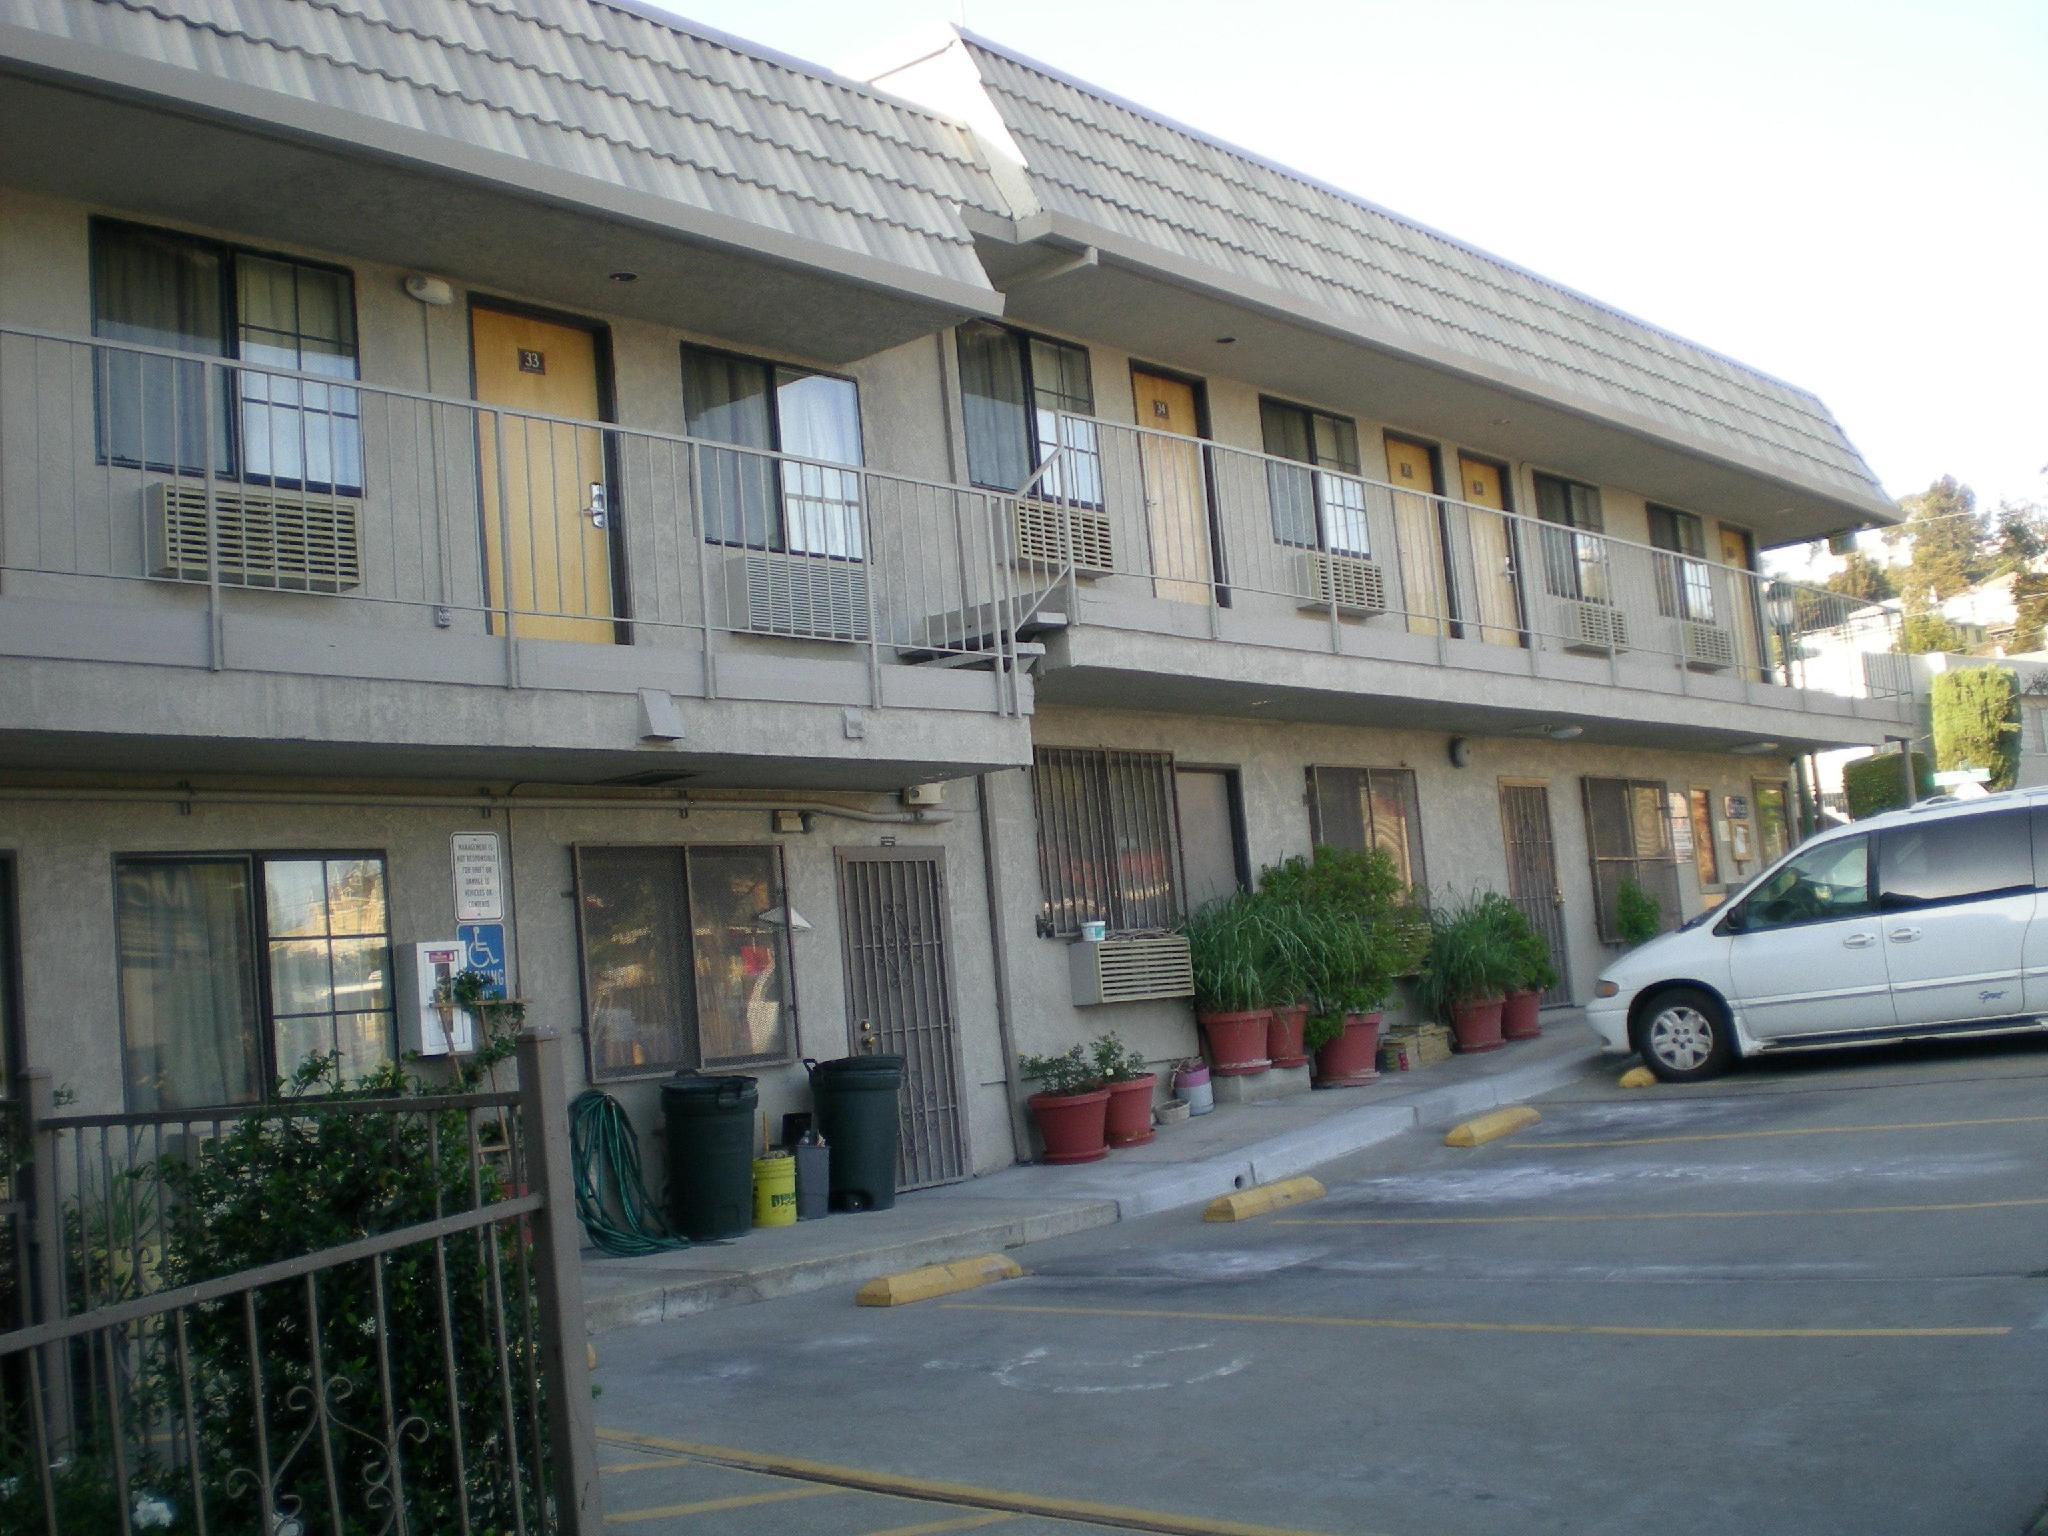 Crown Lodge Motel Oakland, Siskiyou